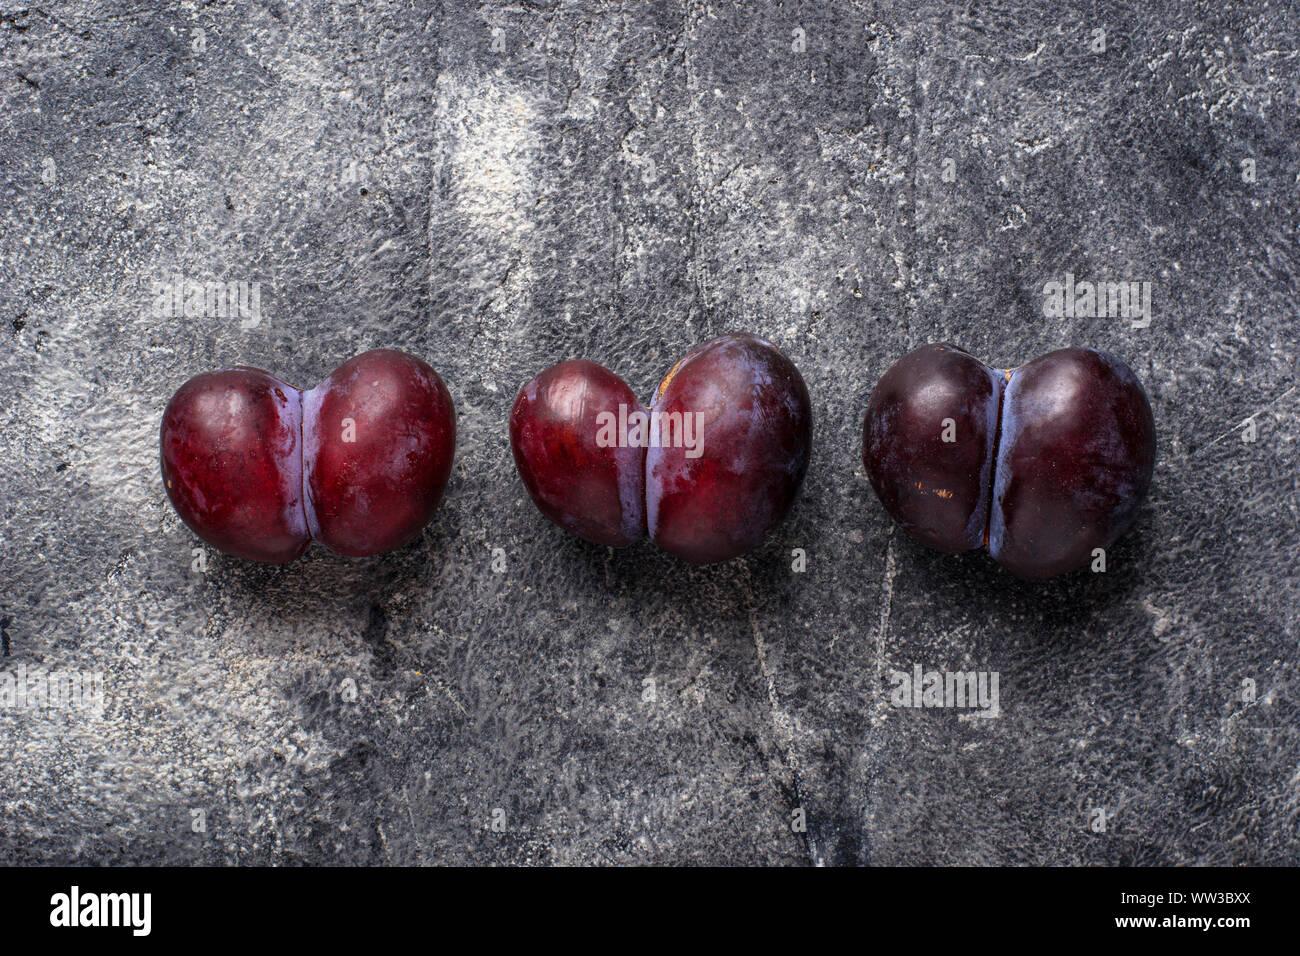 Feo ciruelas. Fruta orgánica anormal Foto de stock